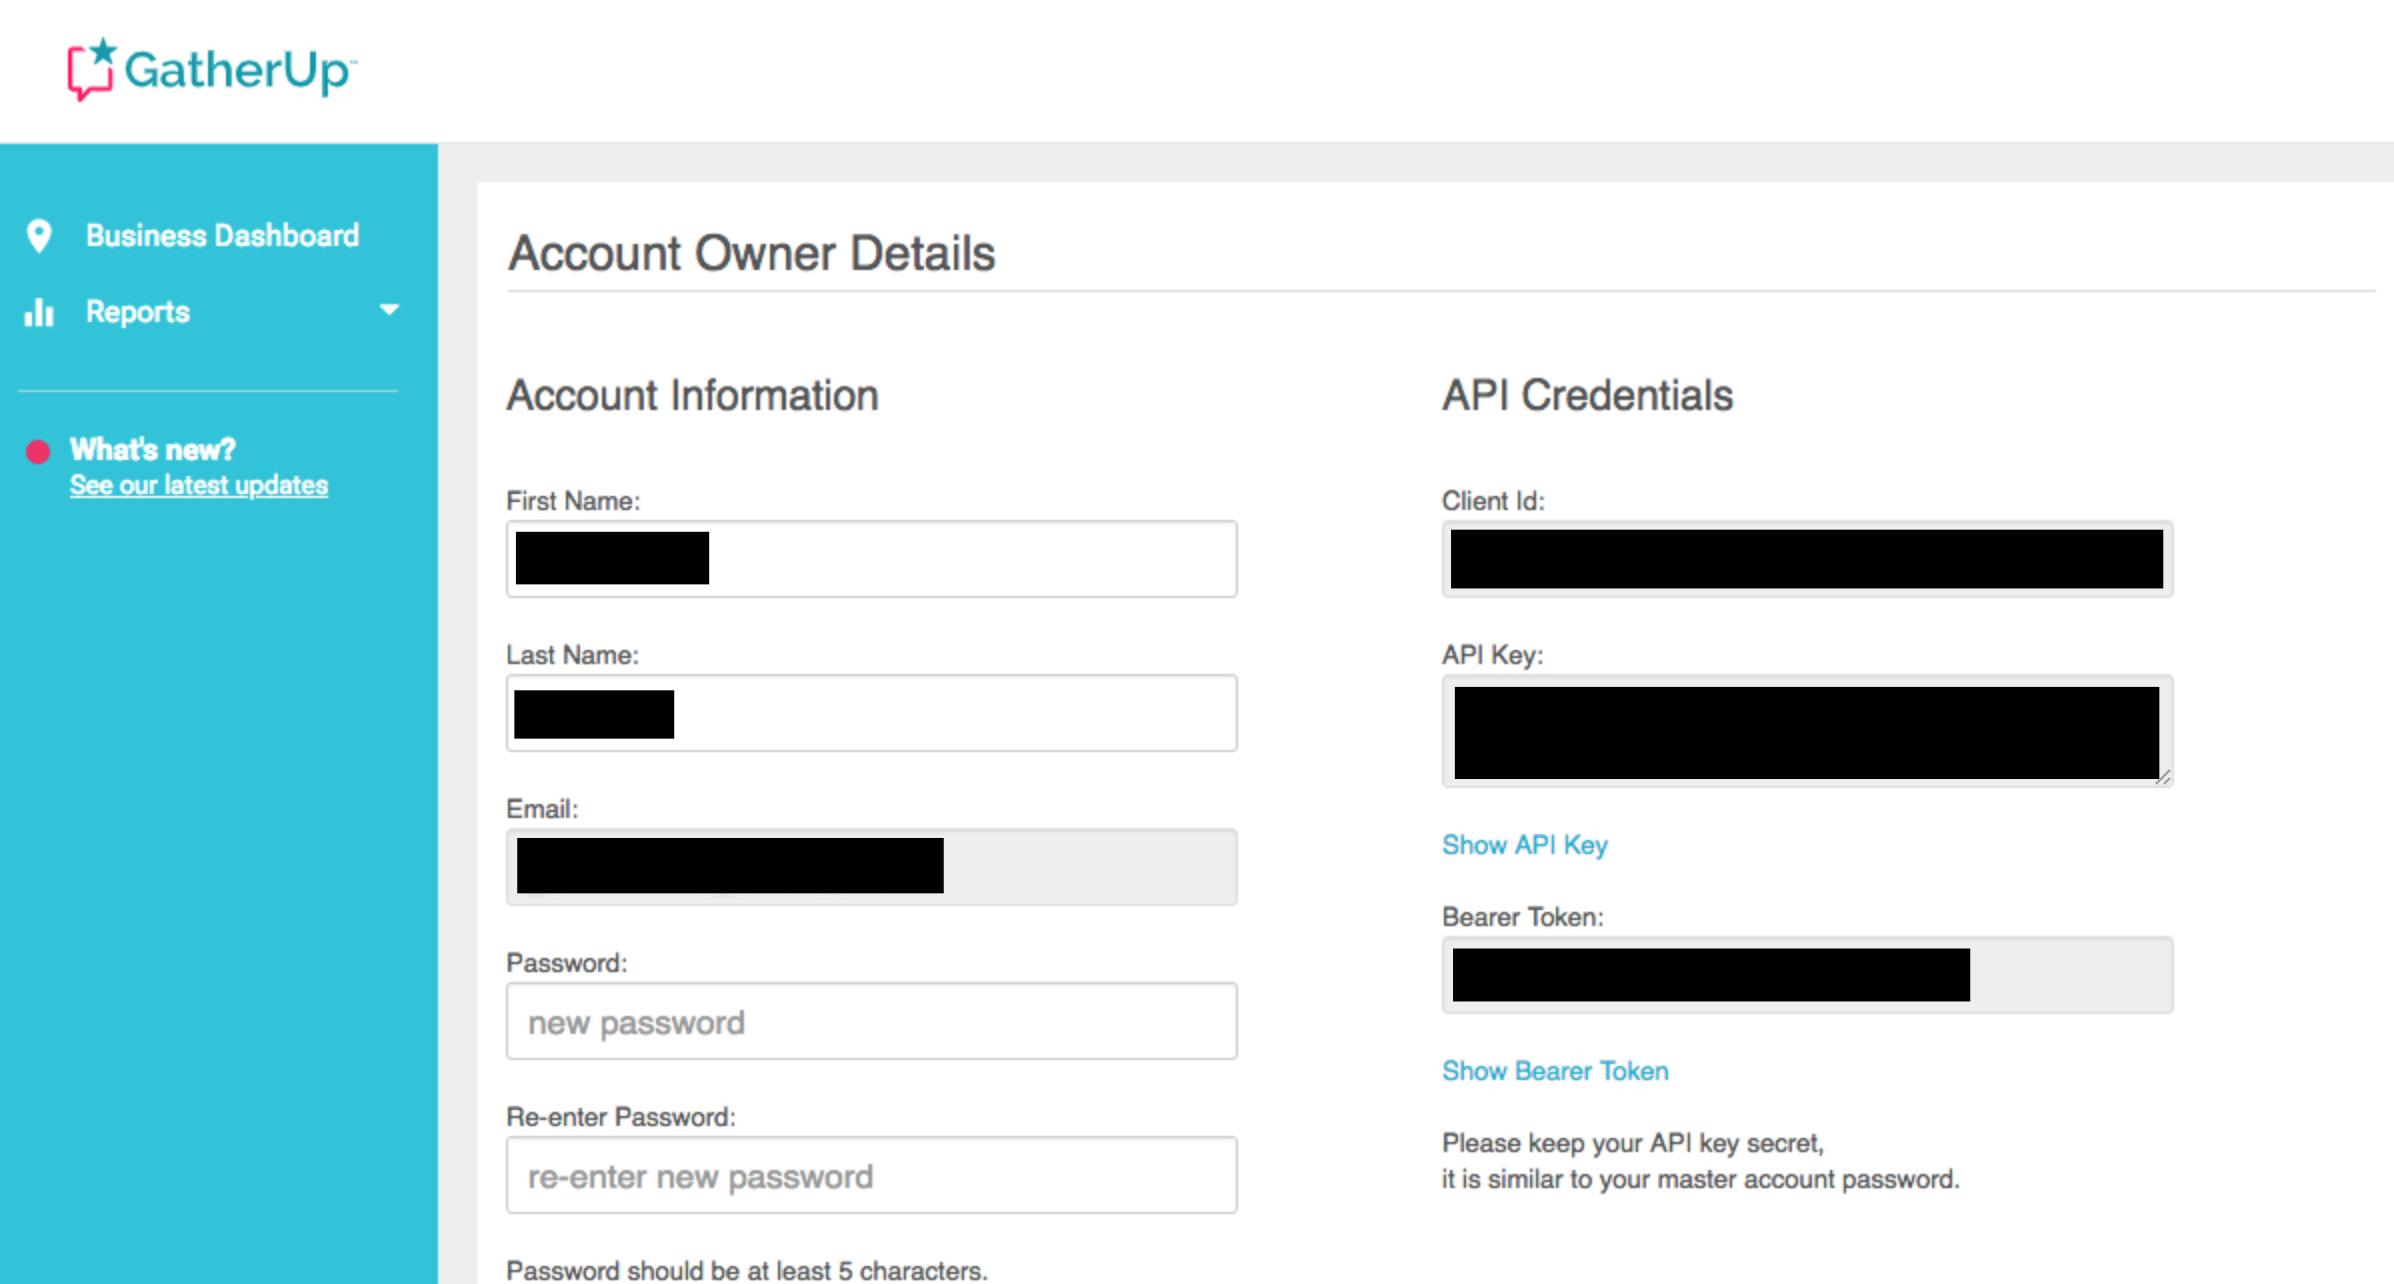 Account information